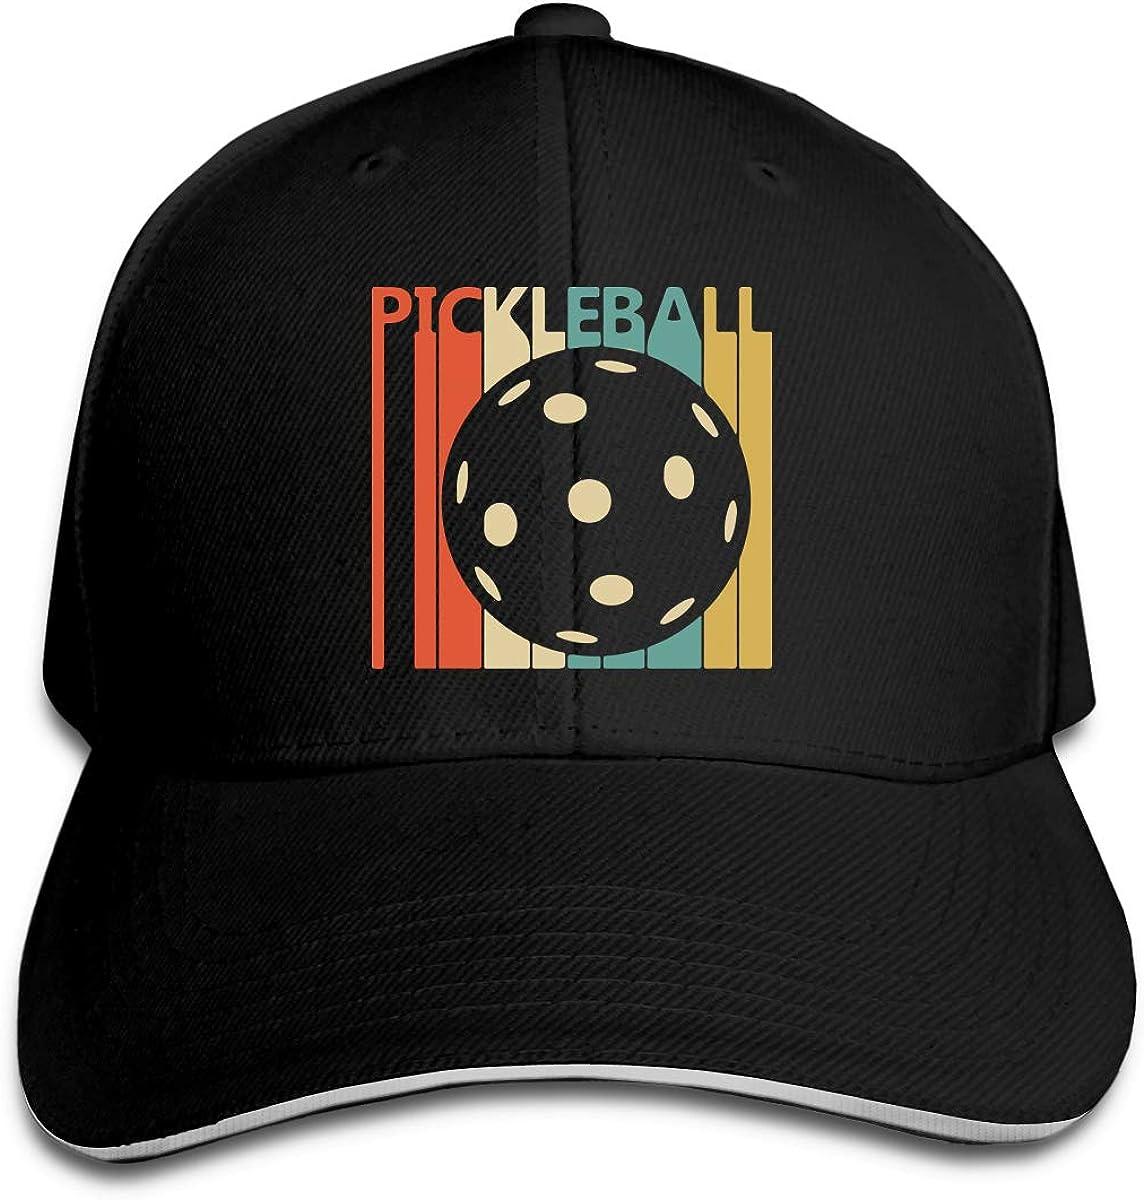 Vintage Retro Pickleball Outdoor Snapback Sandwich Cap Adjustable Baseball Hat Trucker Cap